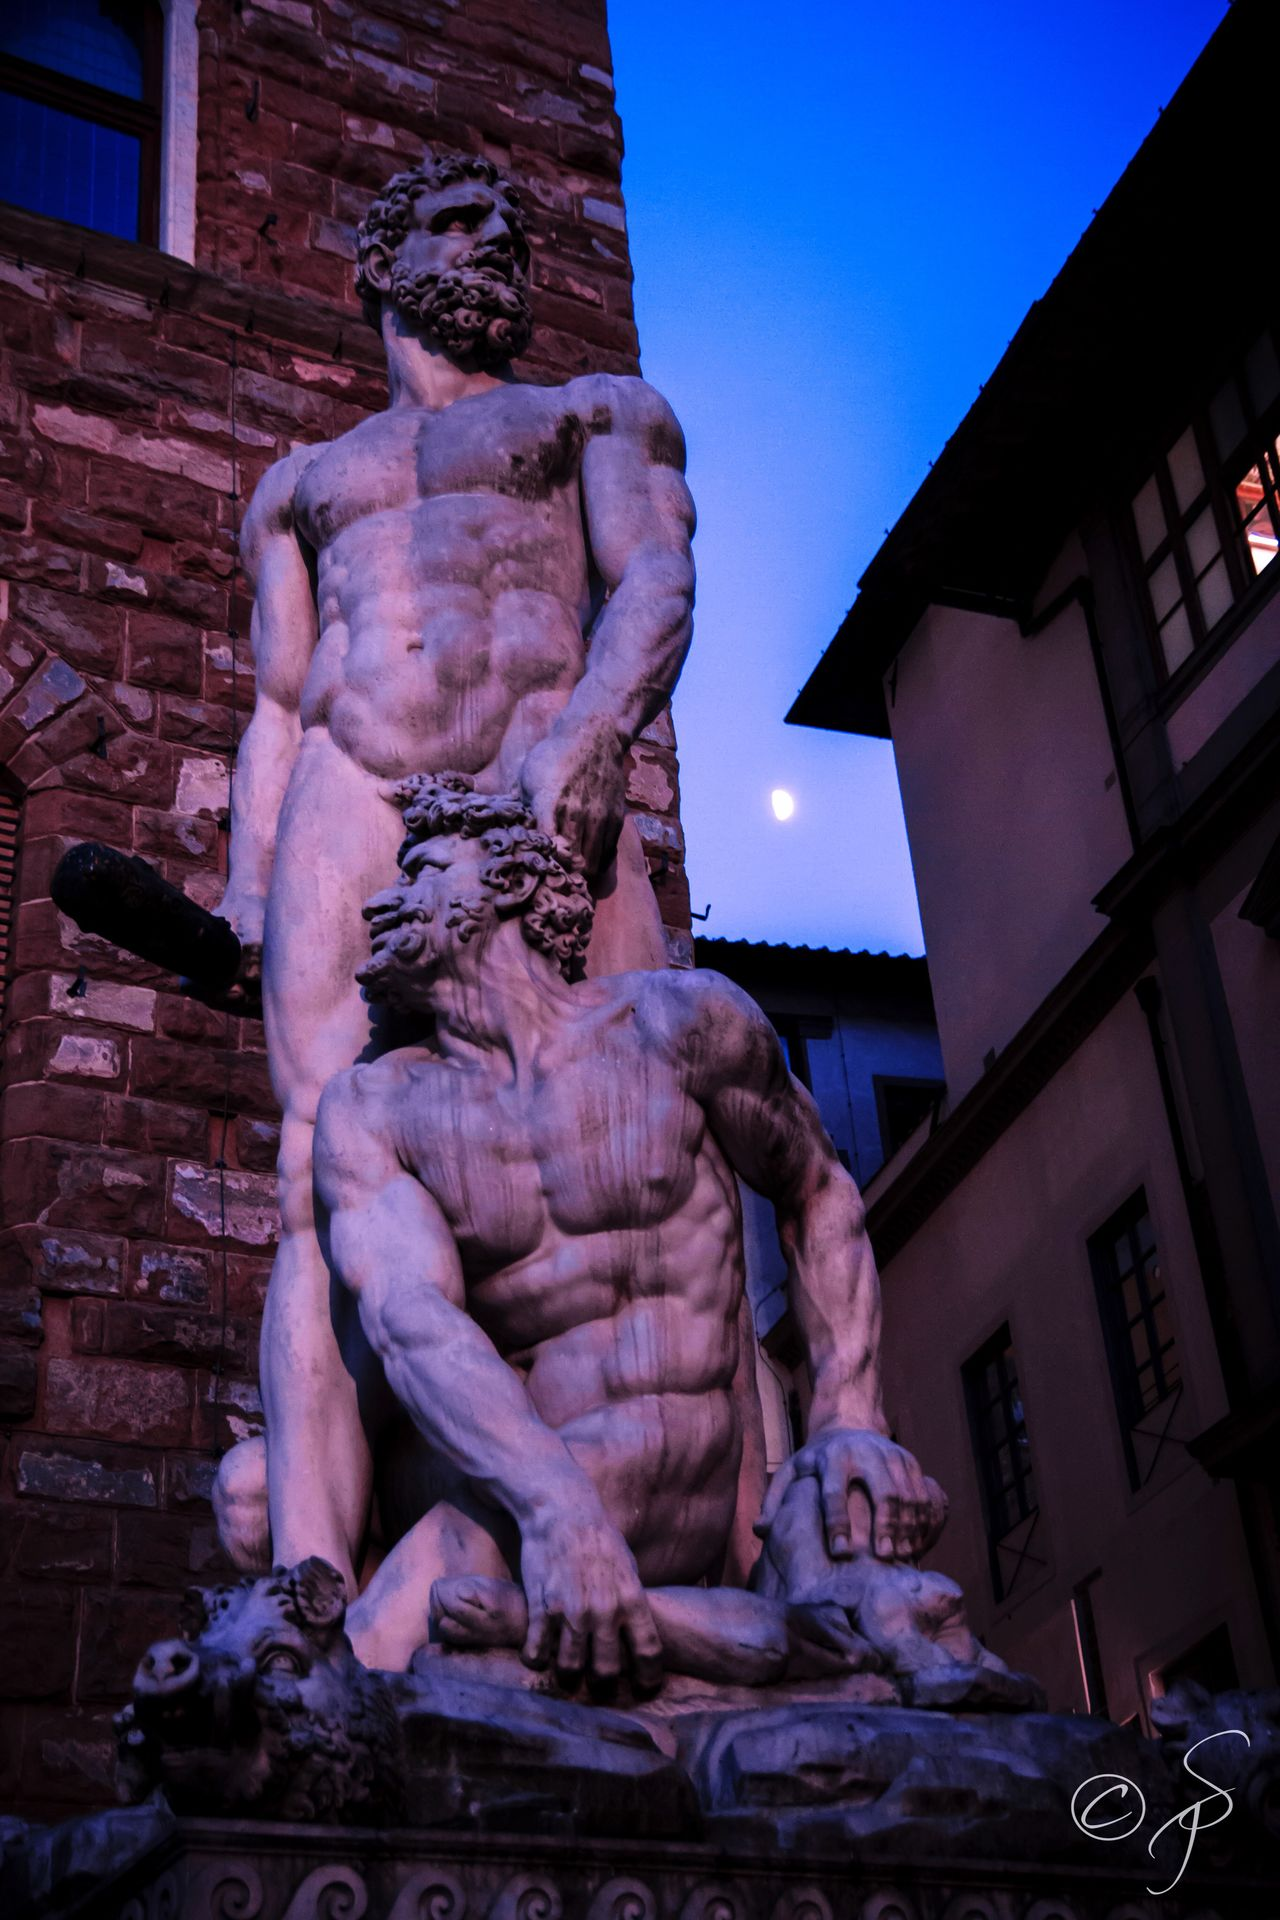 Hercules & Cacus. Piazza della Signoria, Firenze, Italia. 🇮🇹 Firenze Florence Italia Italy Statue Sculpture Clear Sky Outdoors City Sky Moon Moon Light Piazza Della Signoria Ercole E Caco Ercole Hercules Hercules And Cacus